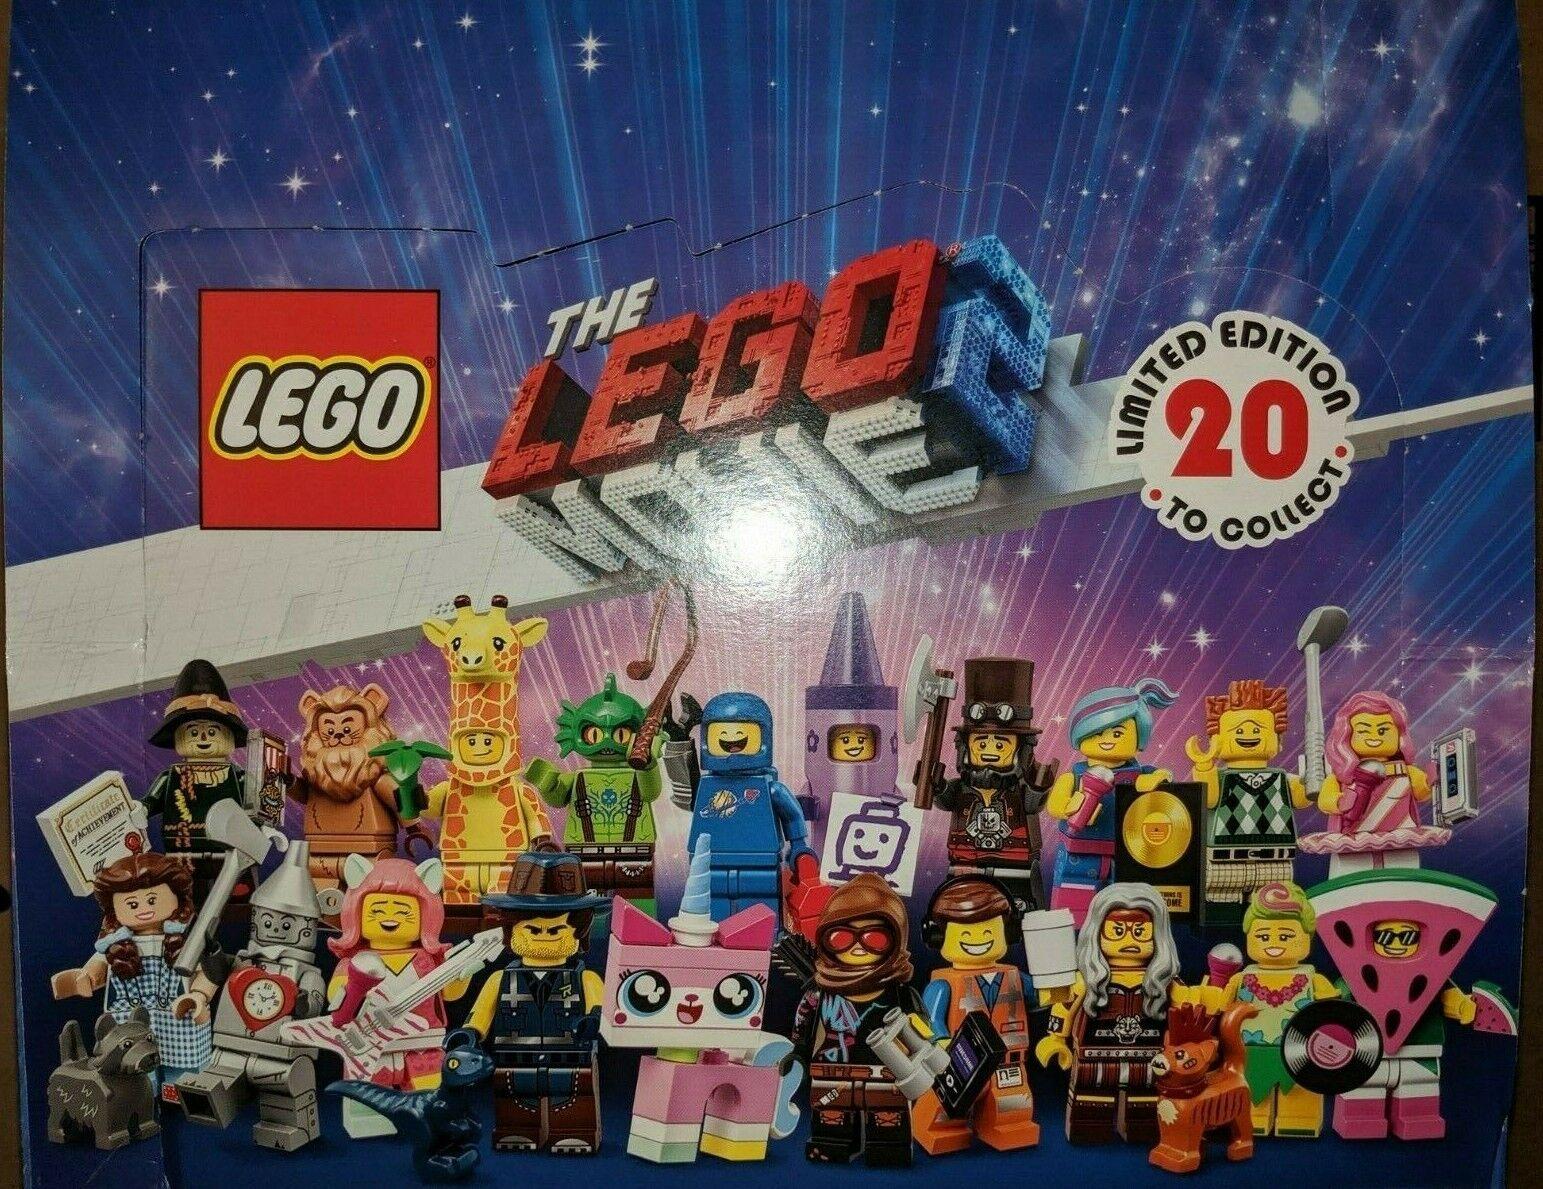 Lego Minifigurer The Lego Movie 2 Case in lådaBRAND NY SEALD 71023